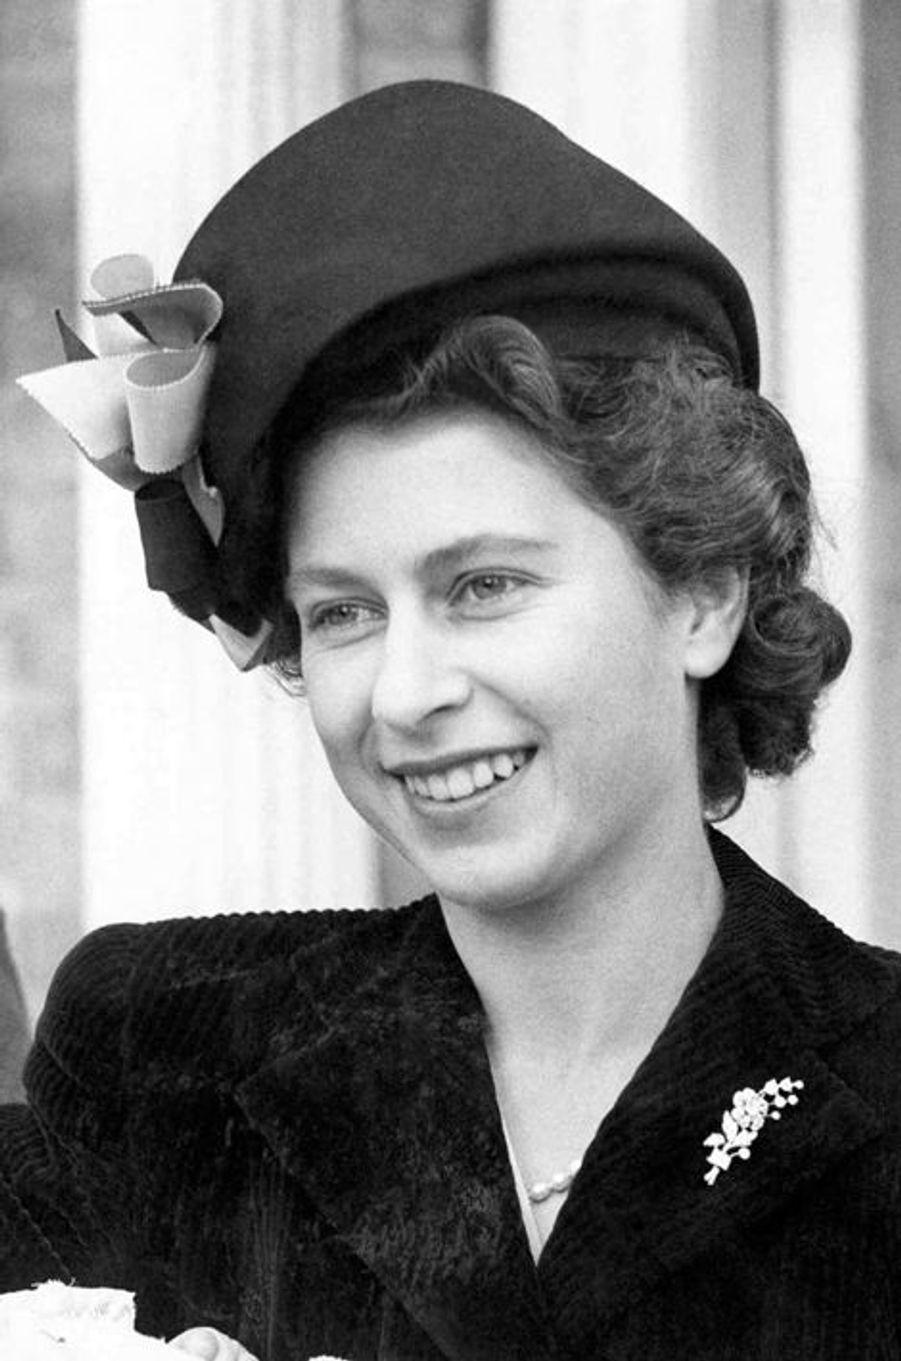 La princesse Elizabeth, le 3 novembre 1947